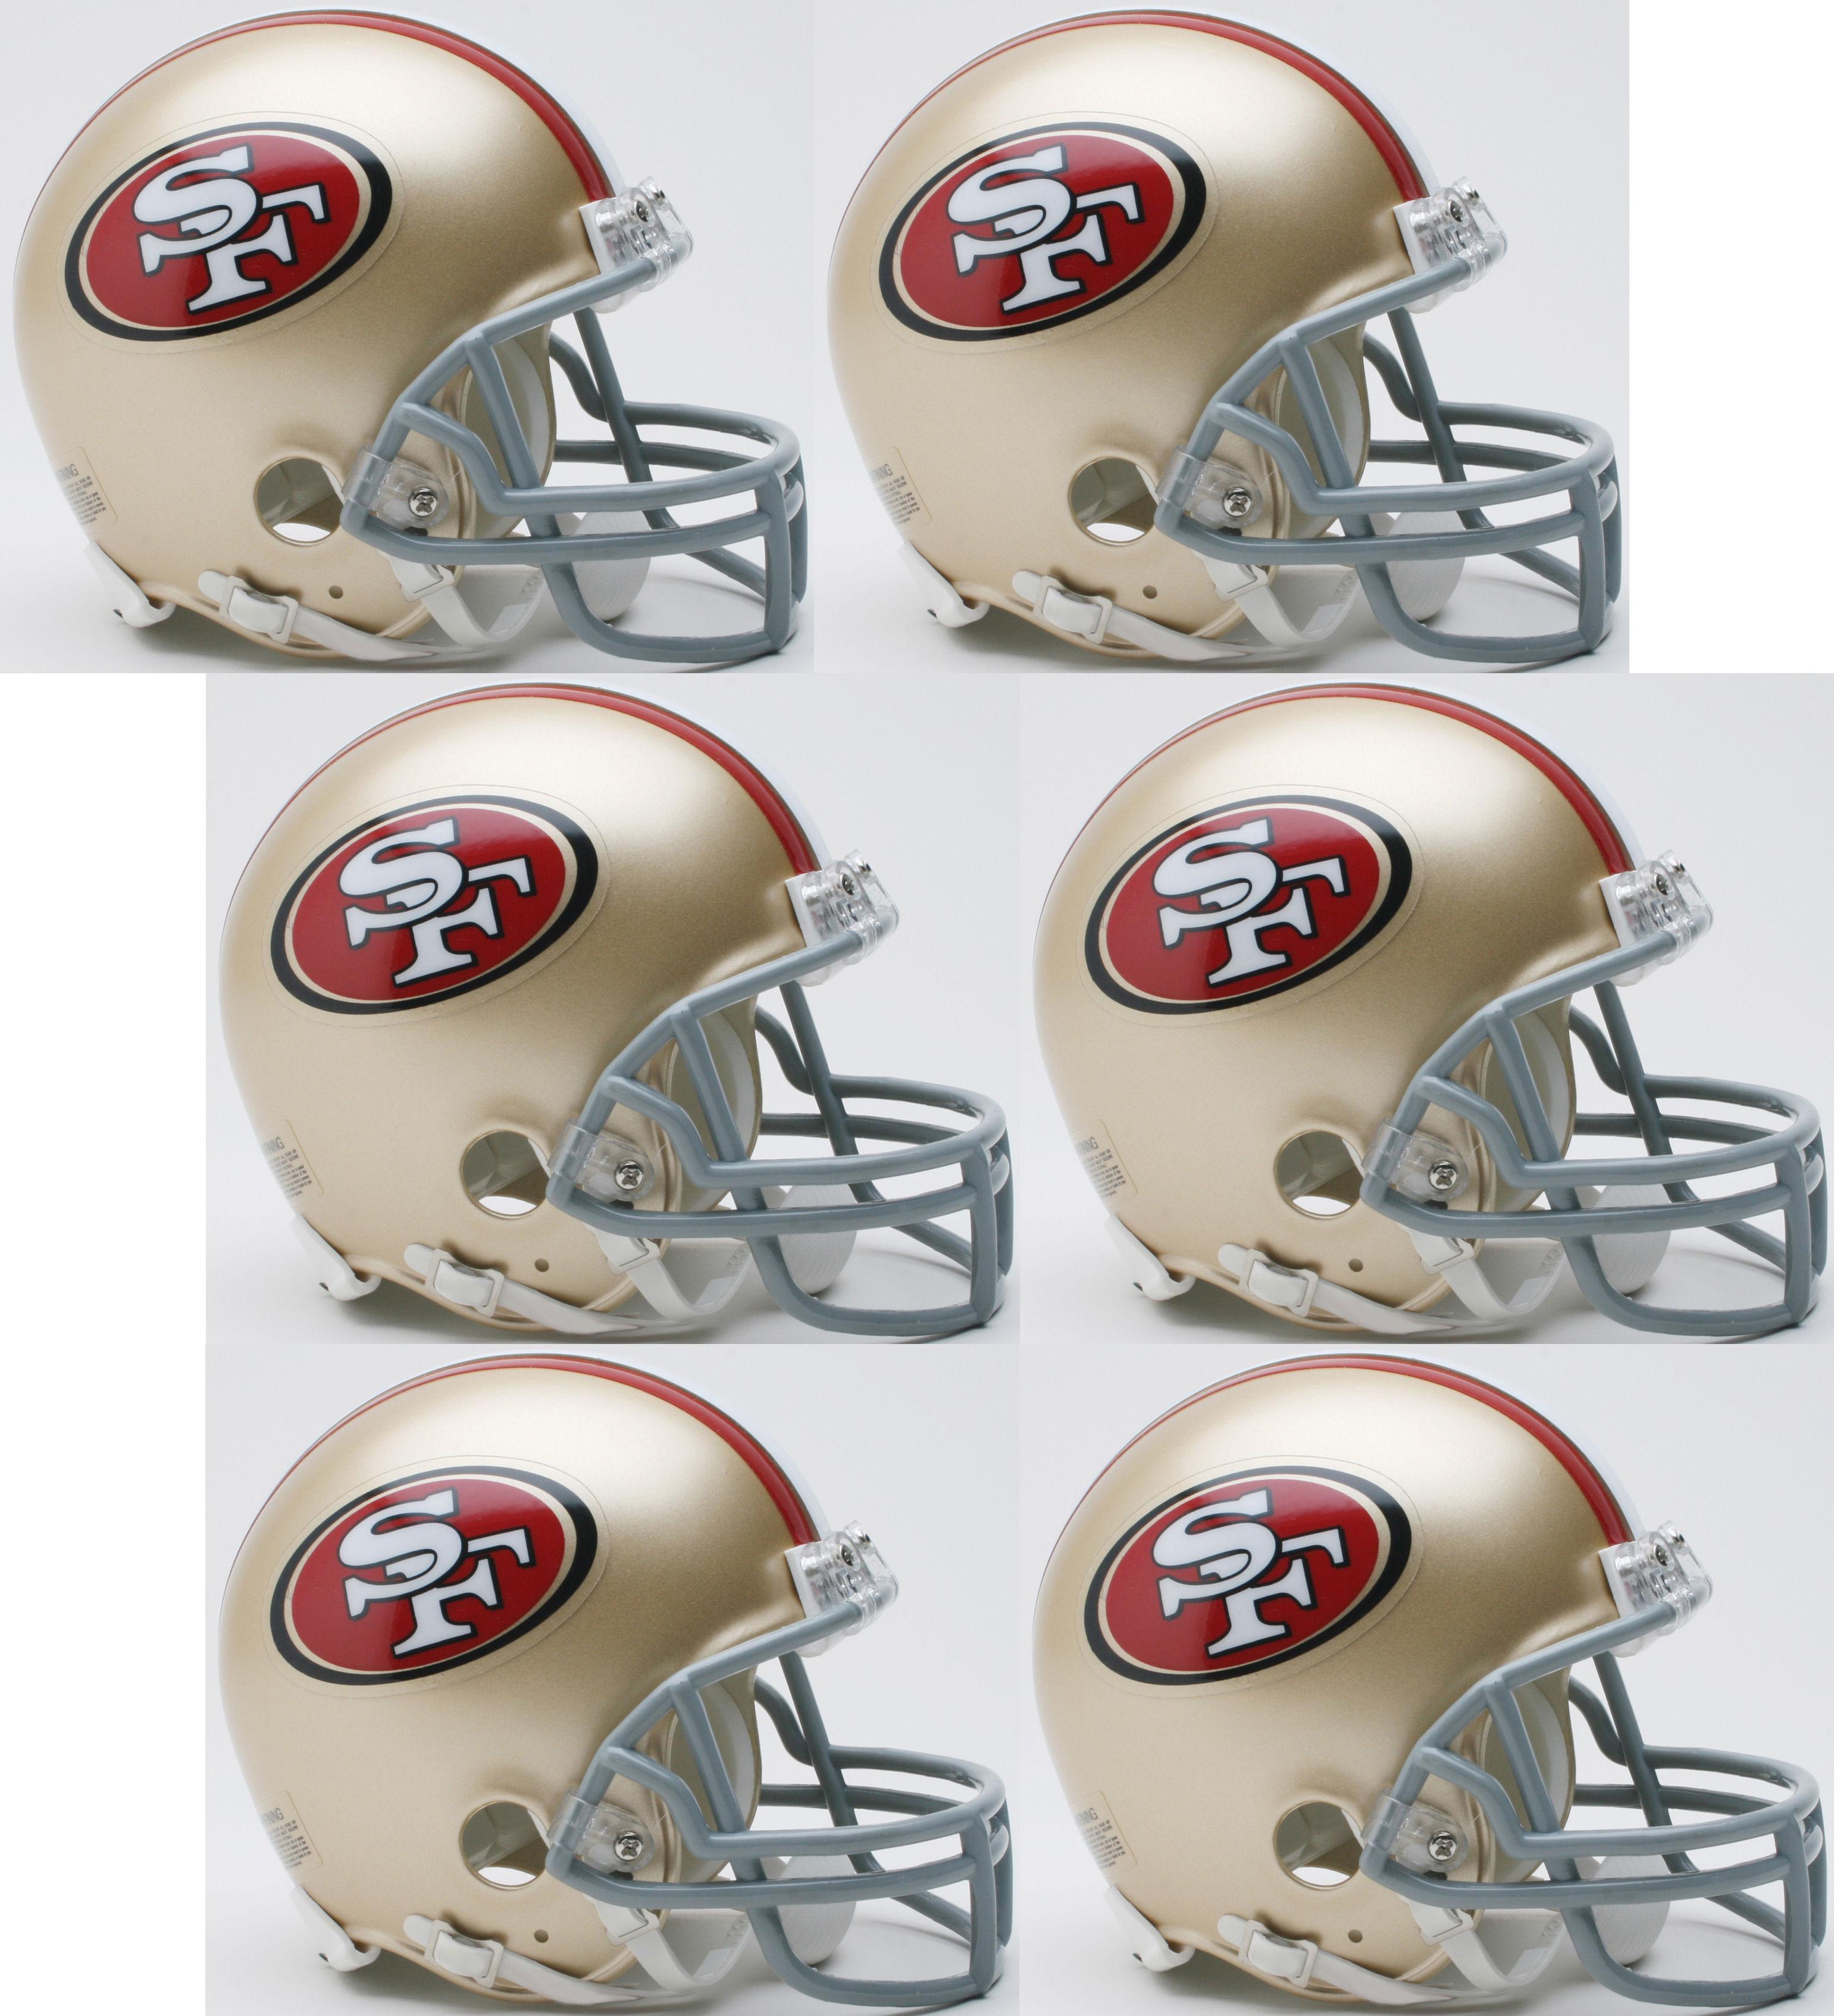 San Francisco 49ers NFL Mini Football Helmet 6 count